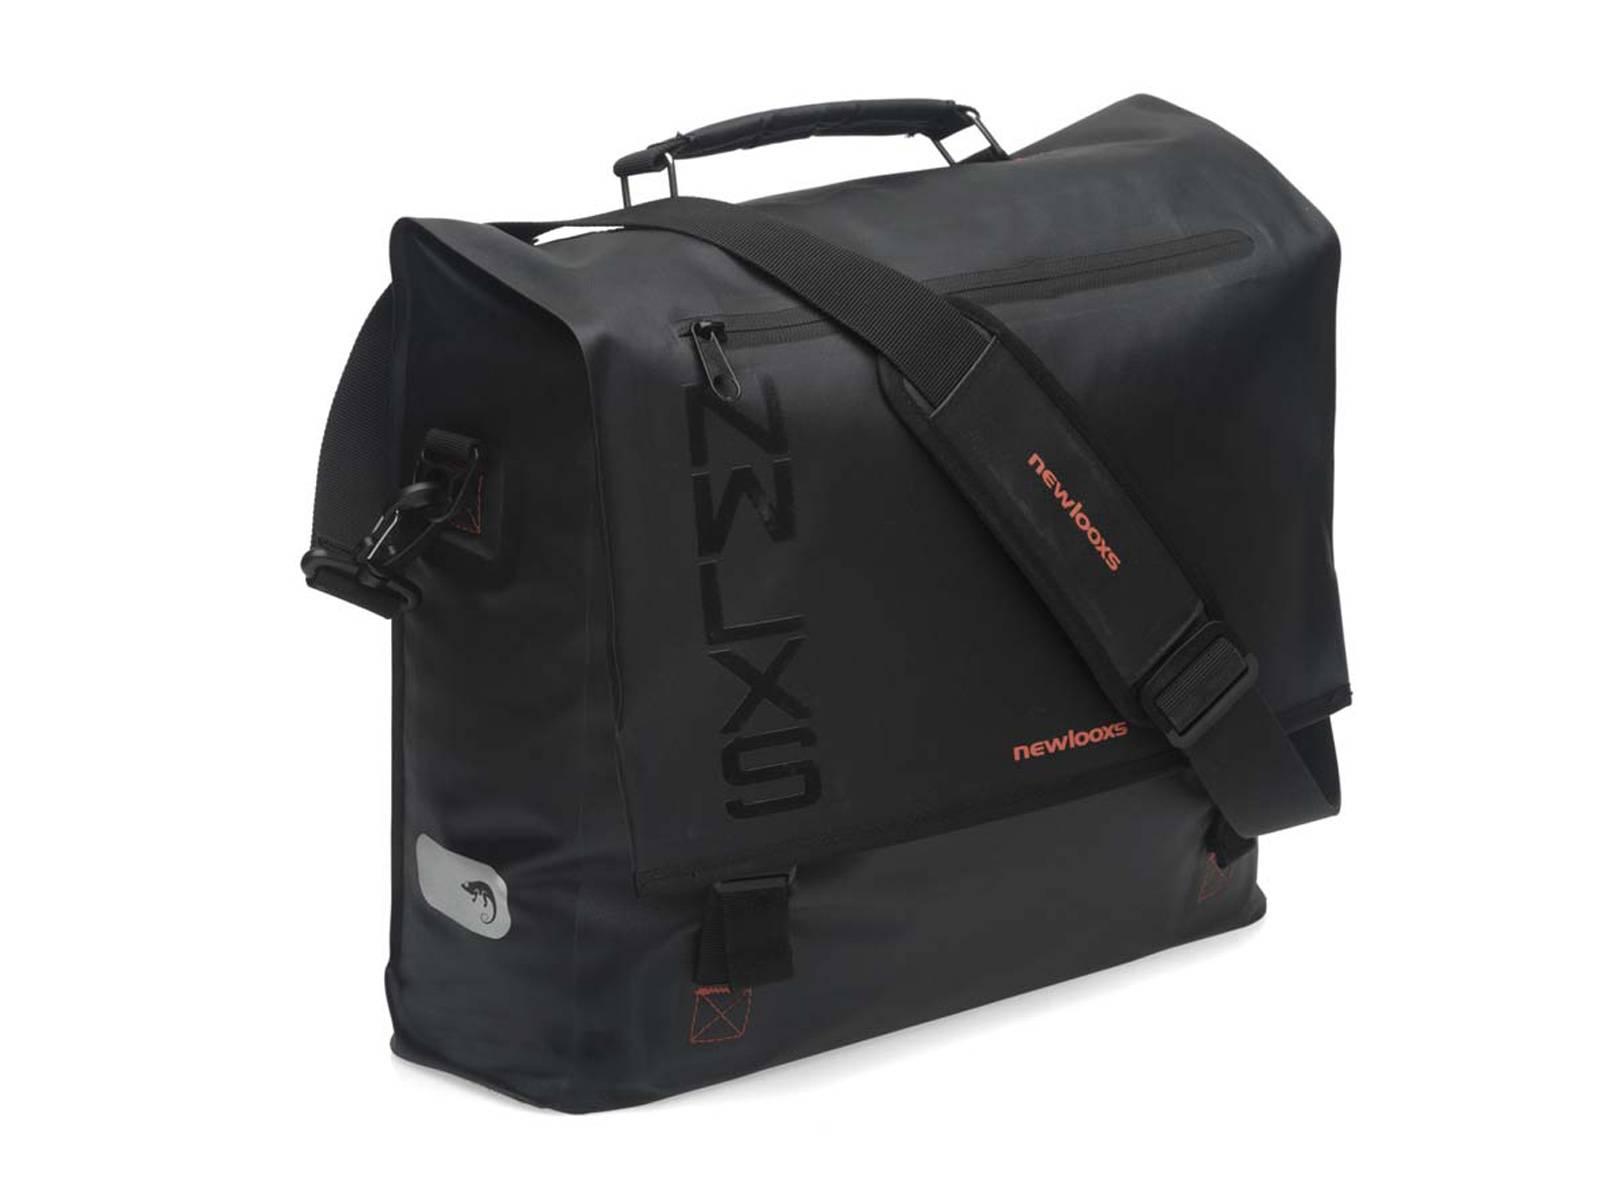 545a4ce29a1 New Looxs shoulder bike bag Varo waterproof black | Bicyclecomfort